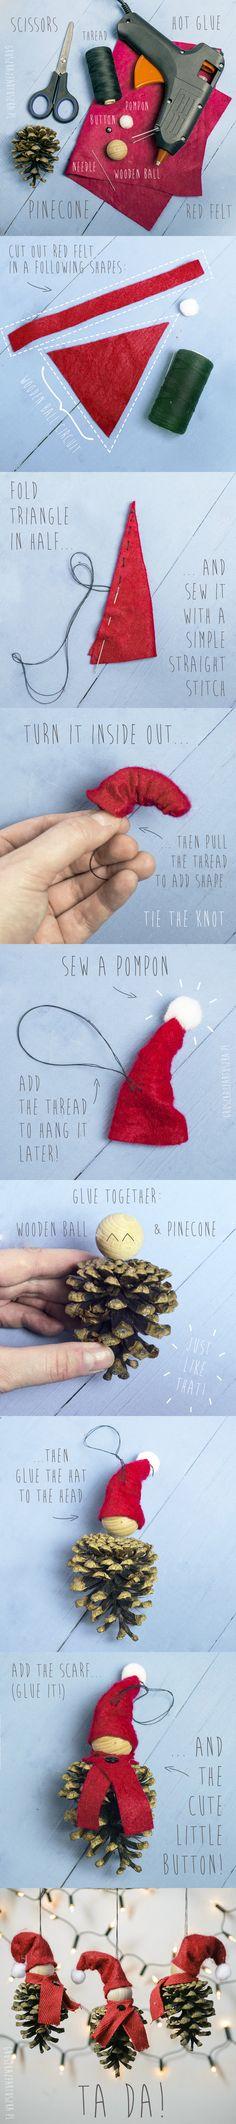 christmas pinecone elves :) by Pokakulka.deviantart.com on @deviantART